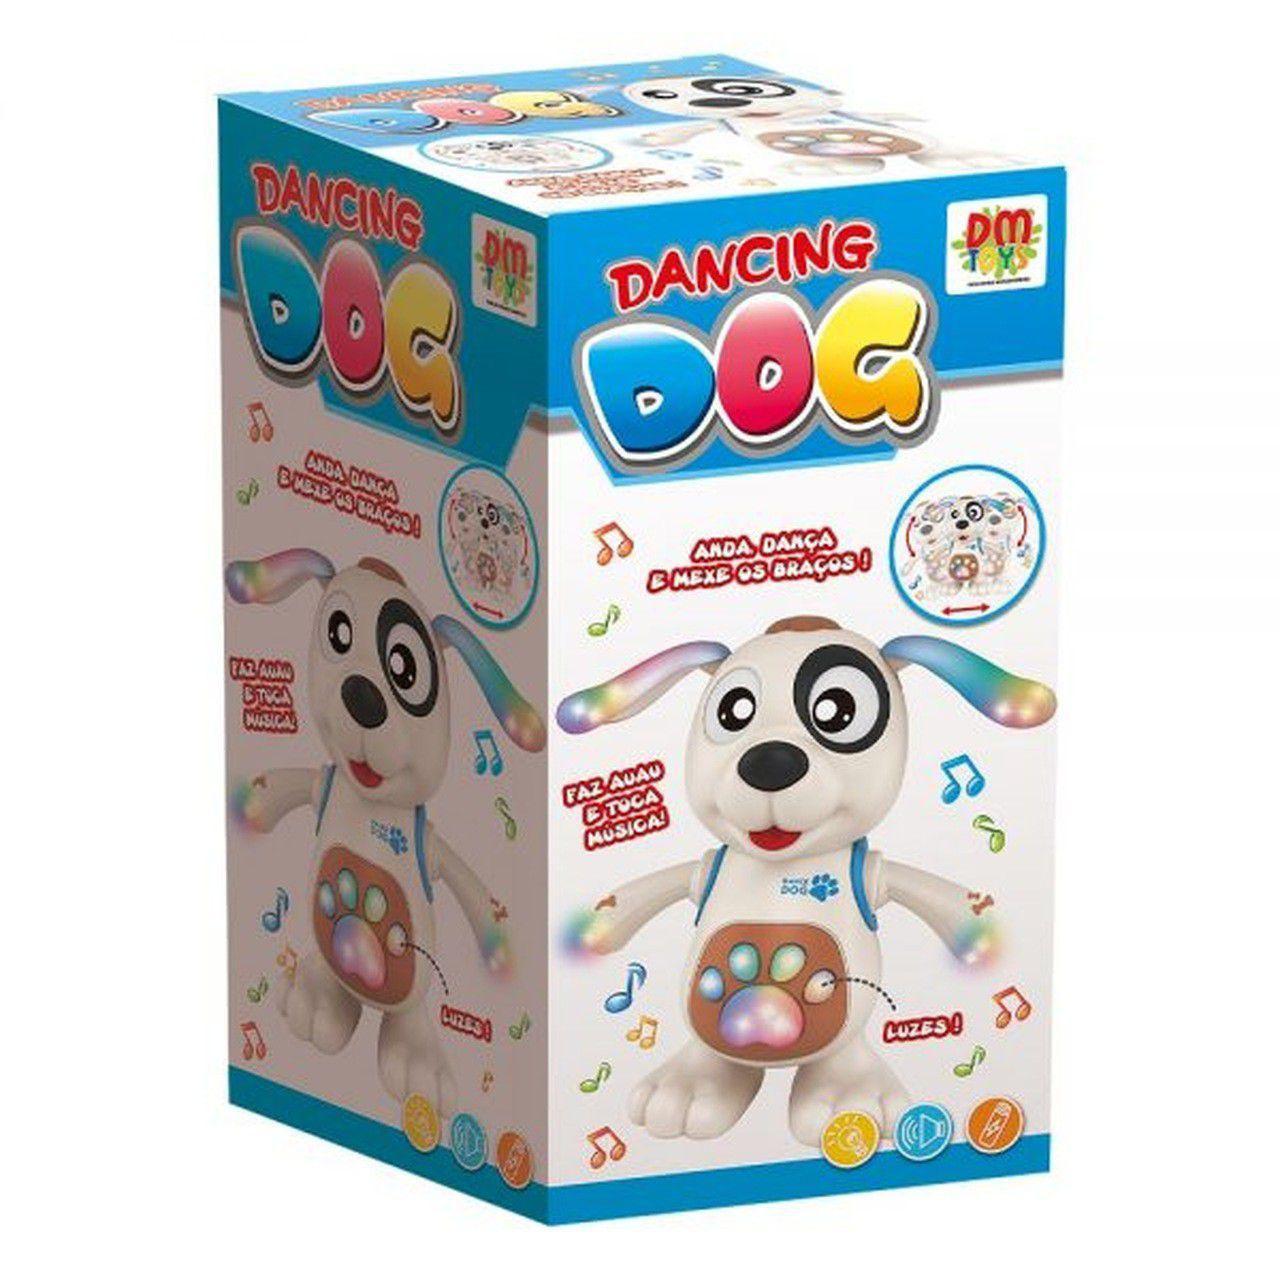 CACHORRO DANÇANTE DANCING DOG DMT5974 DM TOYS